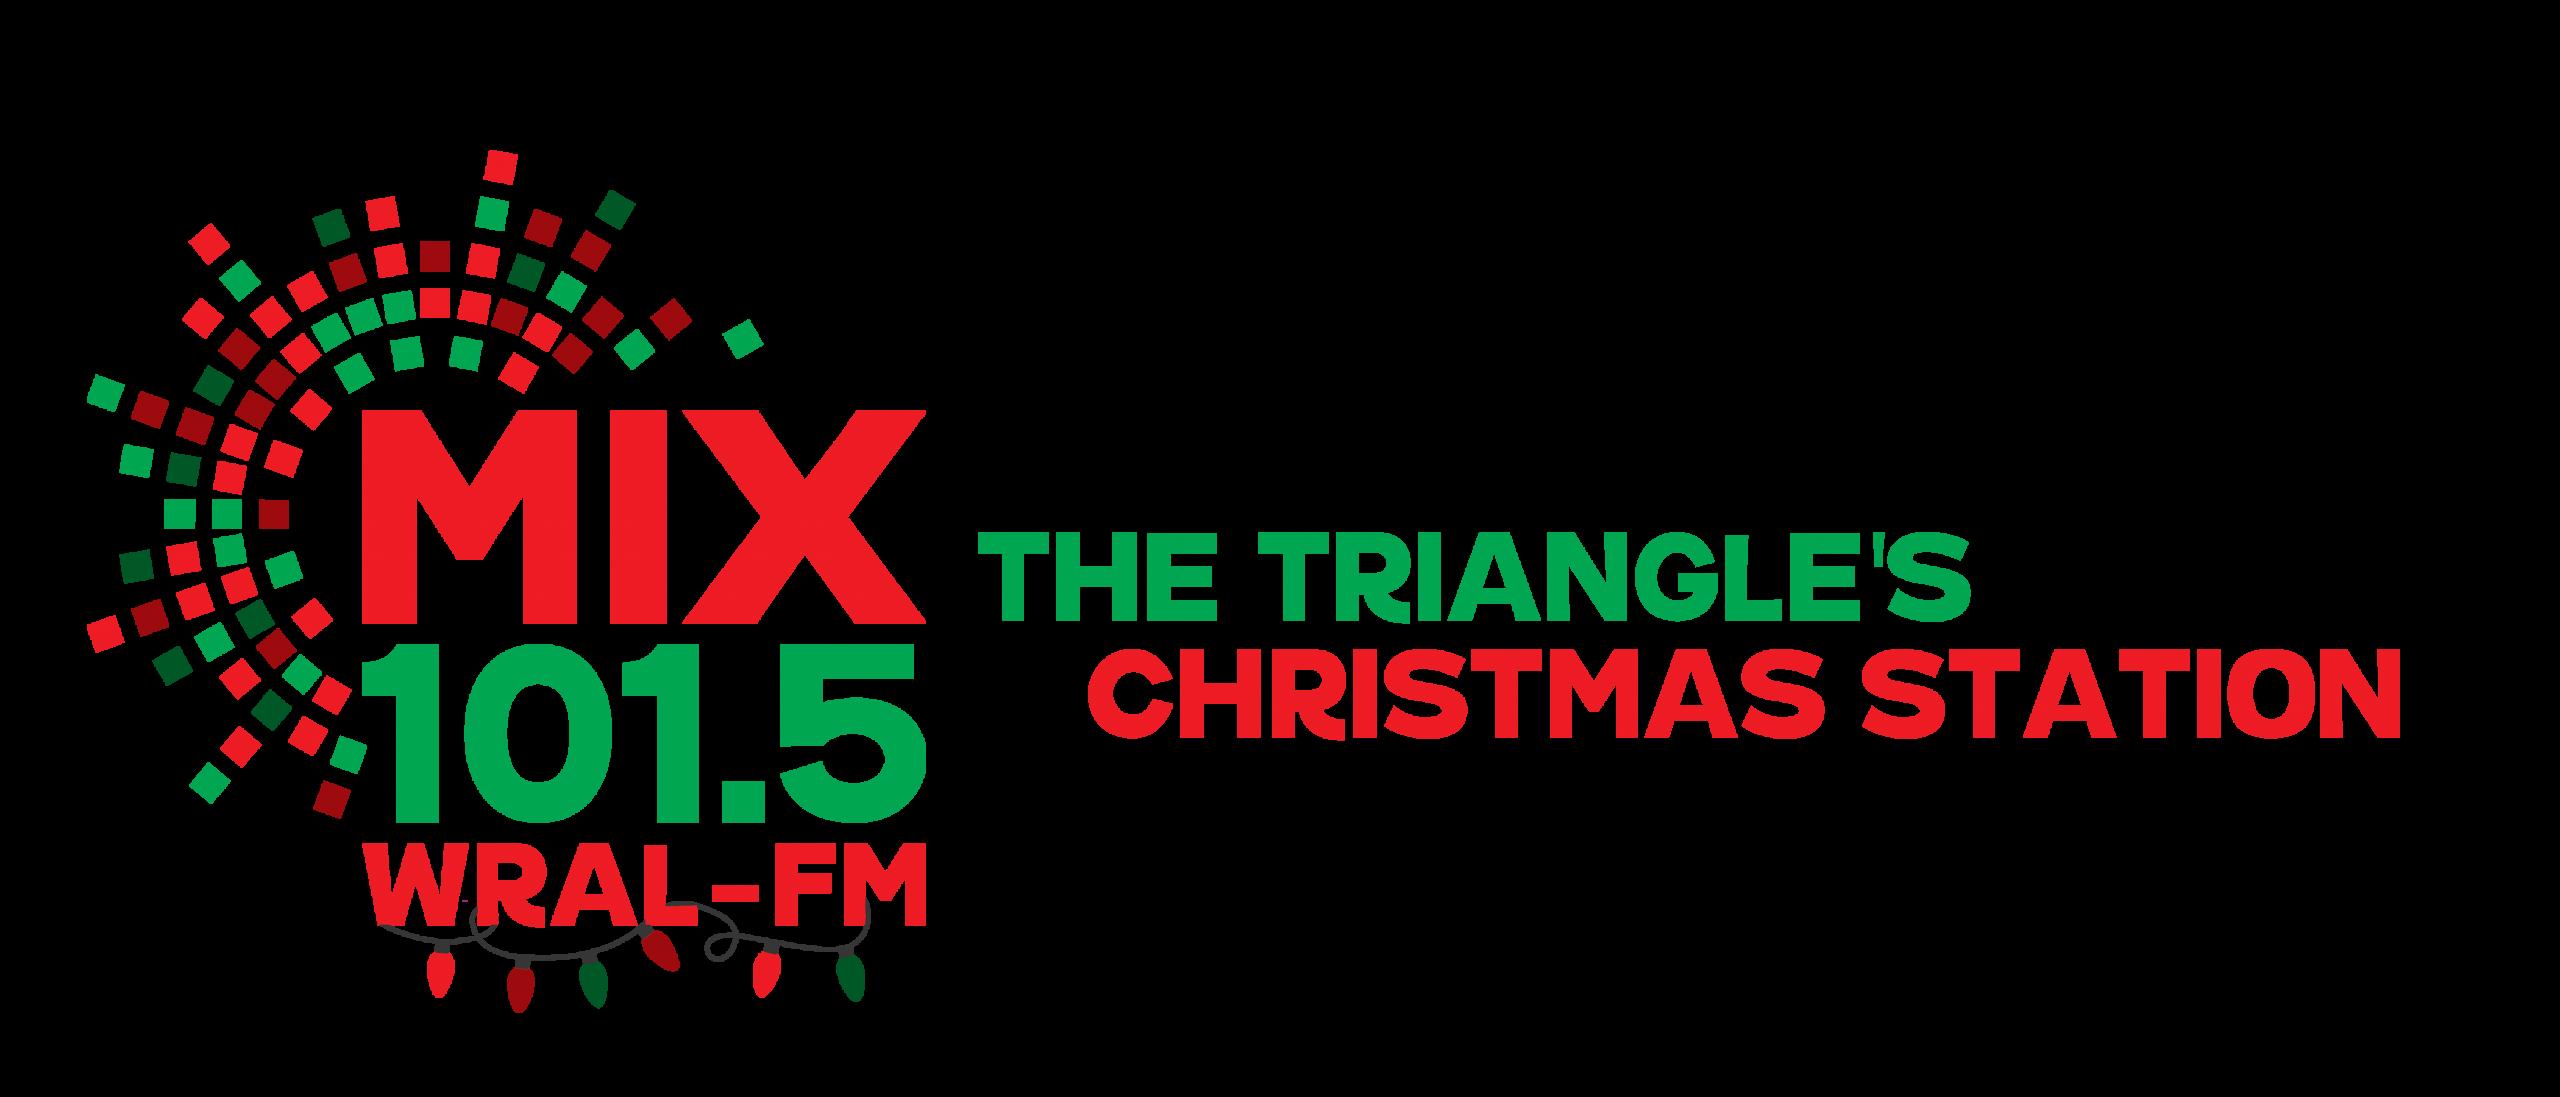 MIX Christmas - MIX 101.5